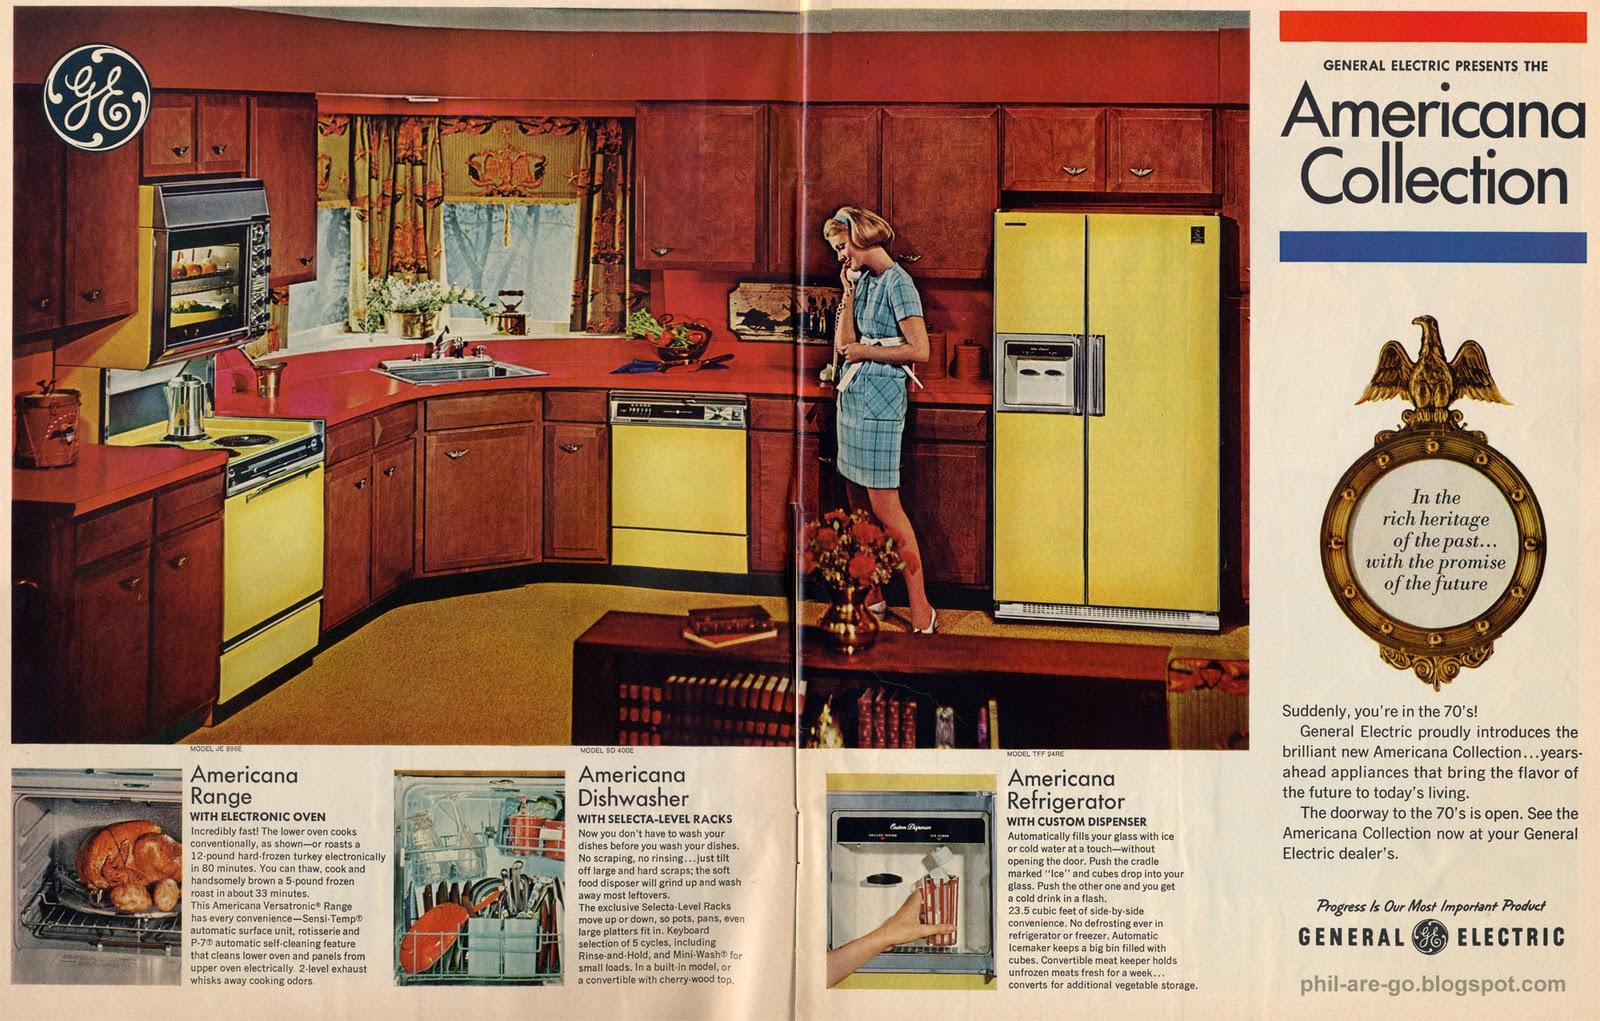 GE Americana Electric Range